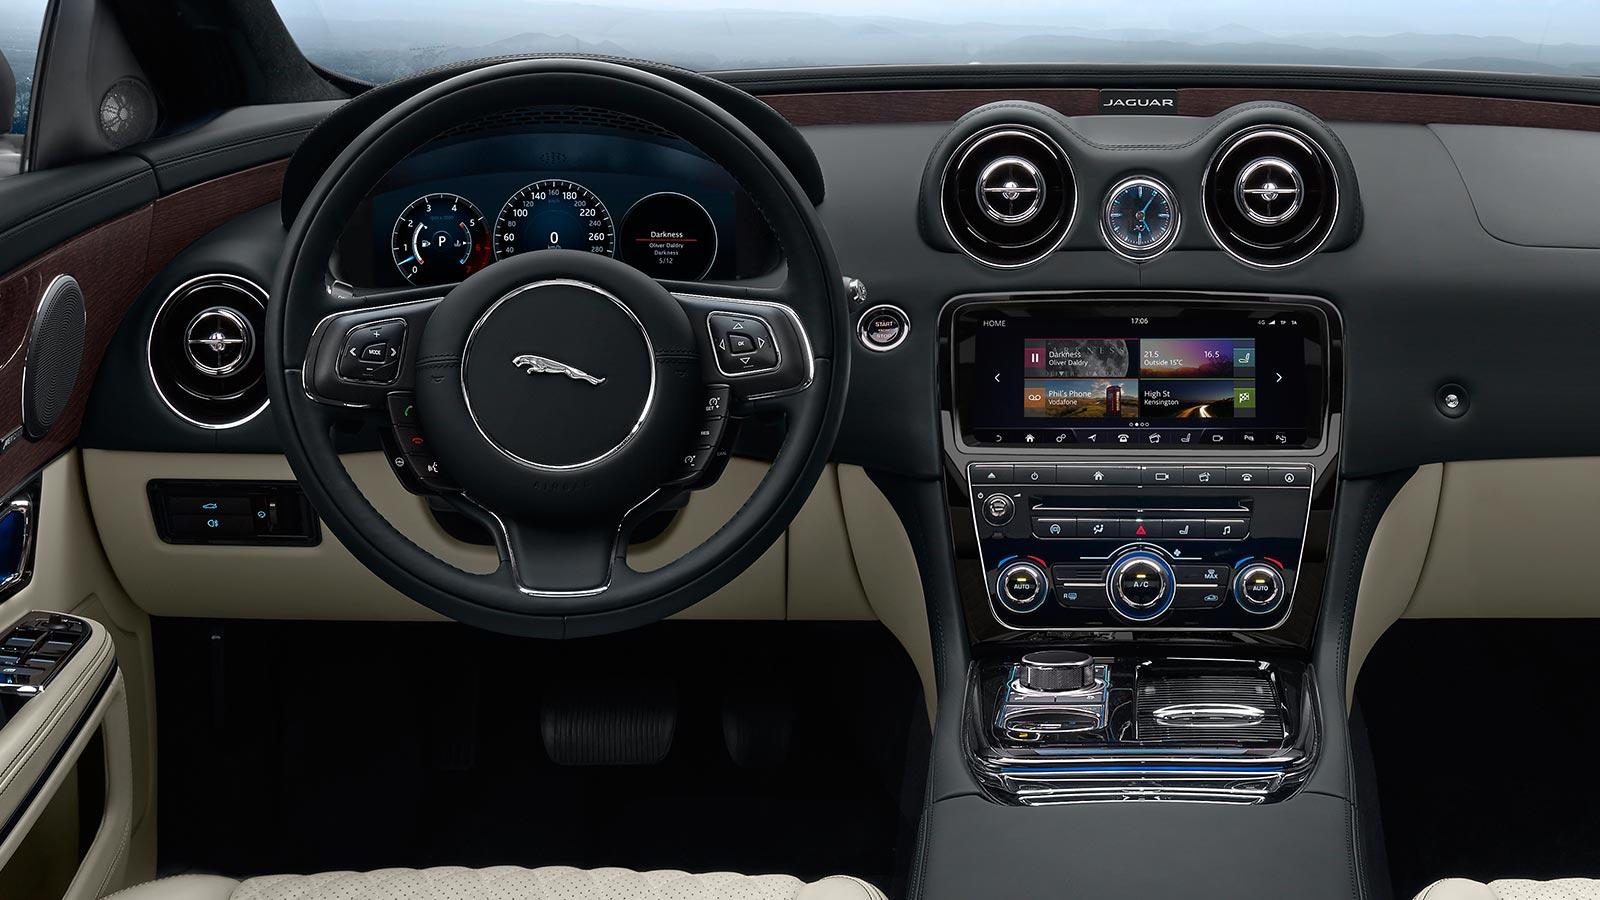 Jaguar XJ 3.0d V6 Portfolio image 9